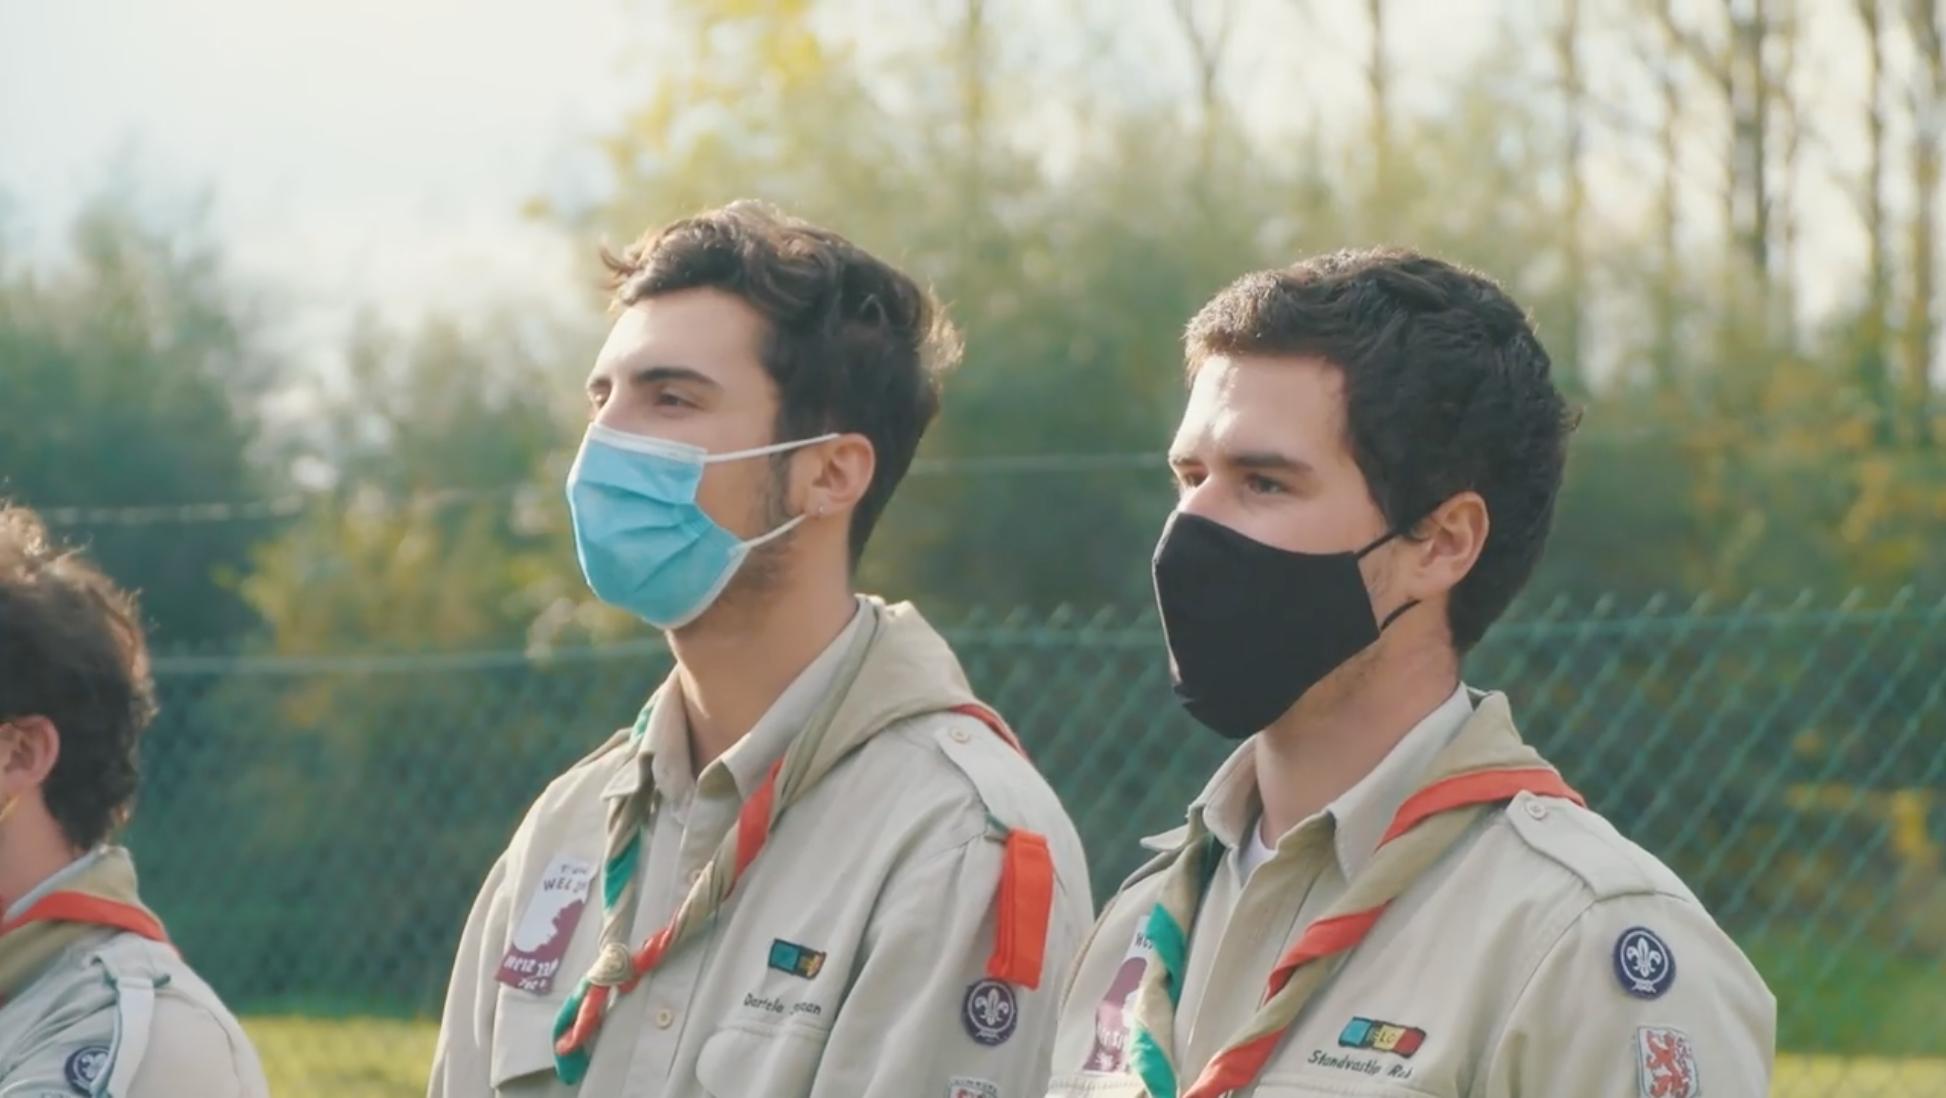 Sam Lambrechts (rechts) van Scouts Sint-Martinus op de lancering van de nationale campagne 'Plant je eigen bos'.